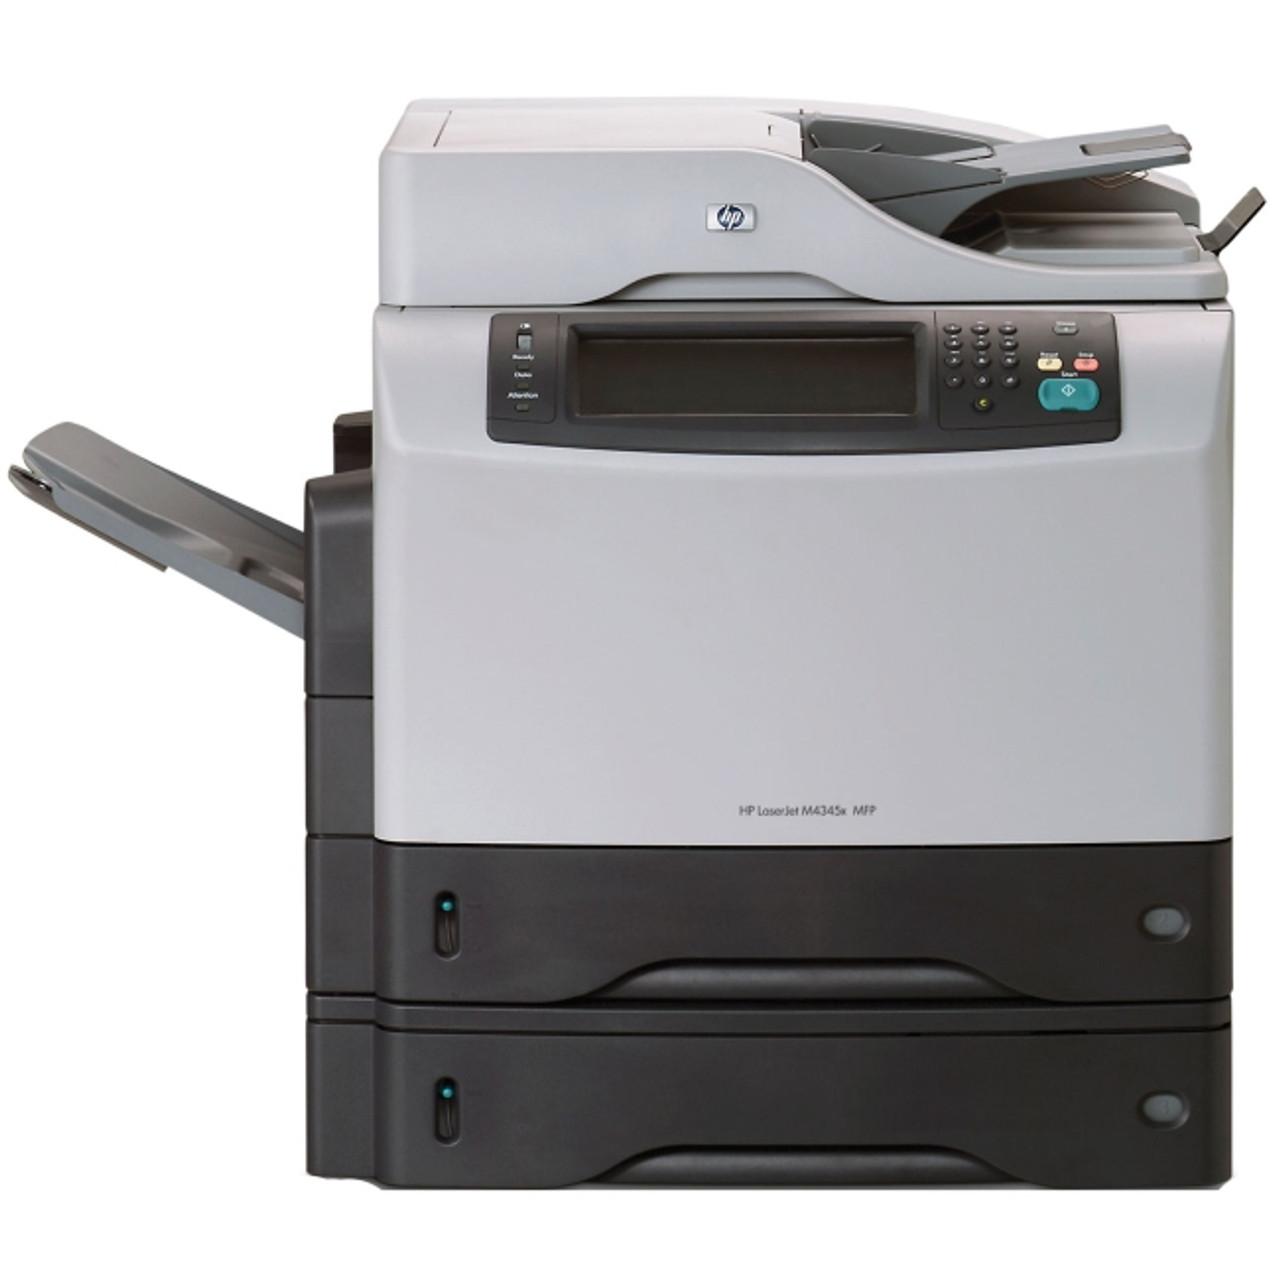 HP LaserJet M4345X MFP - CB426A -  HP Laser Printer for sale